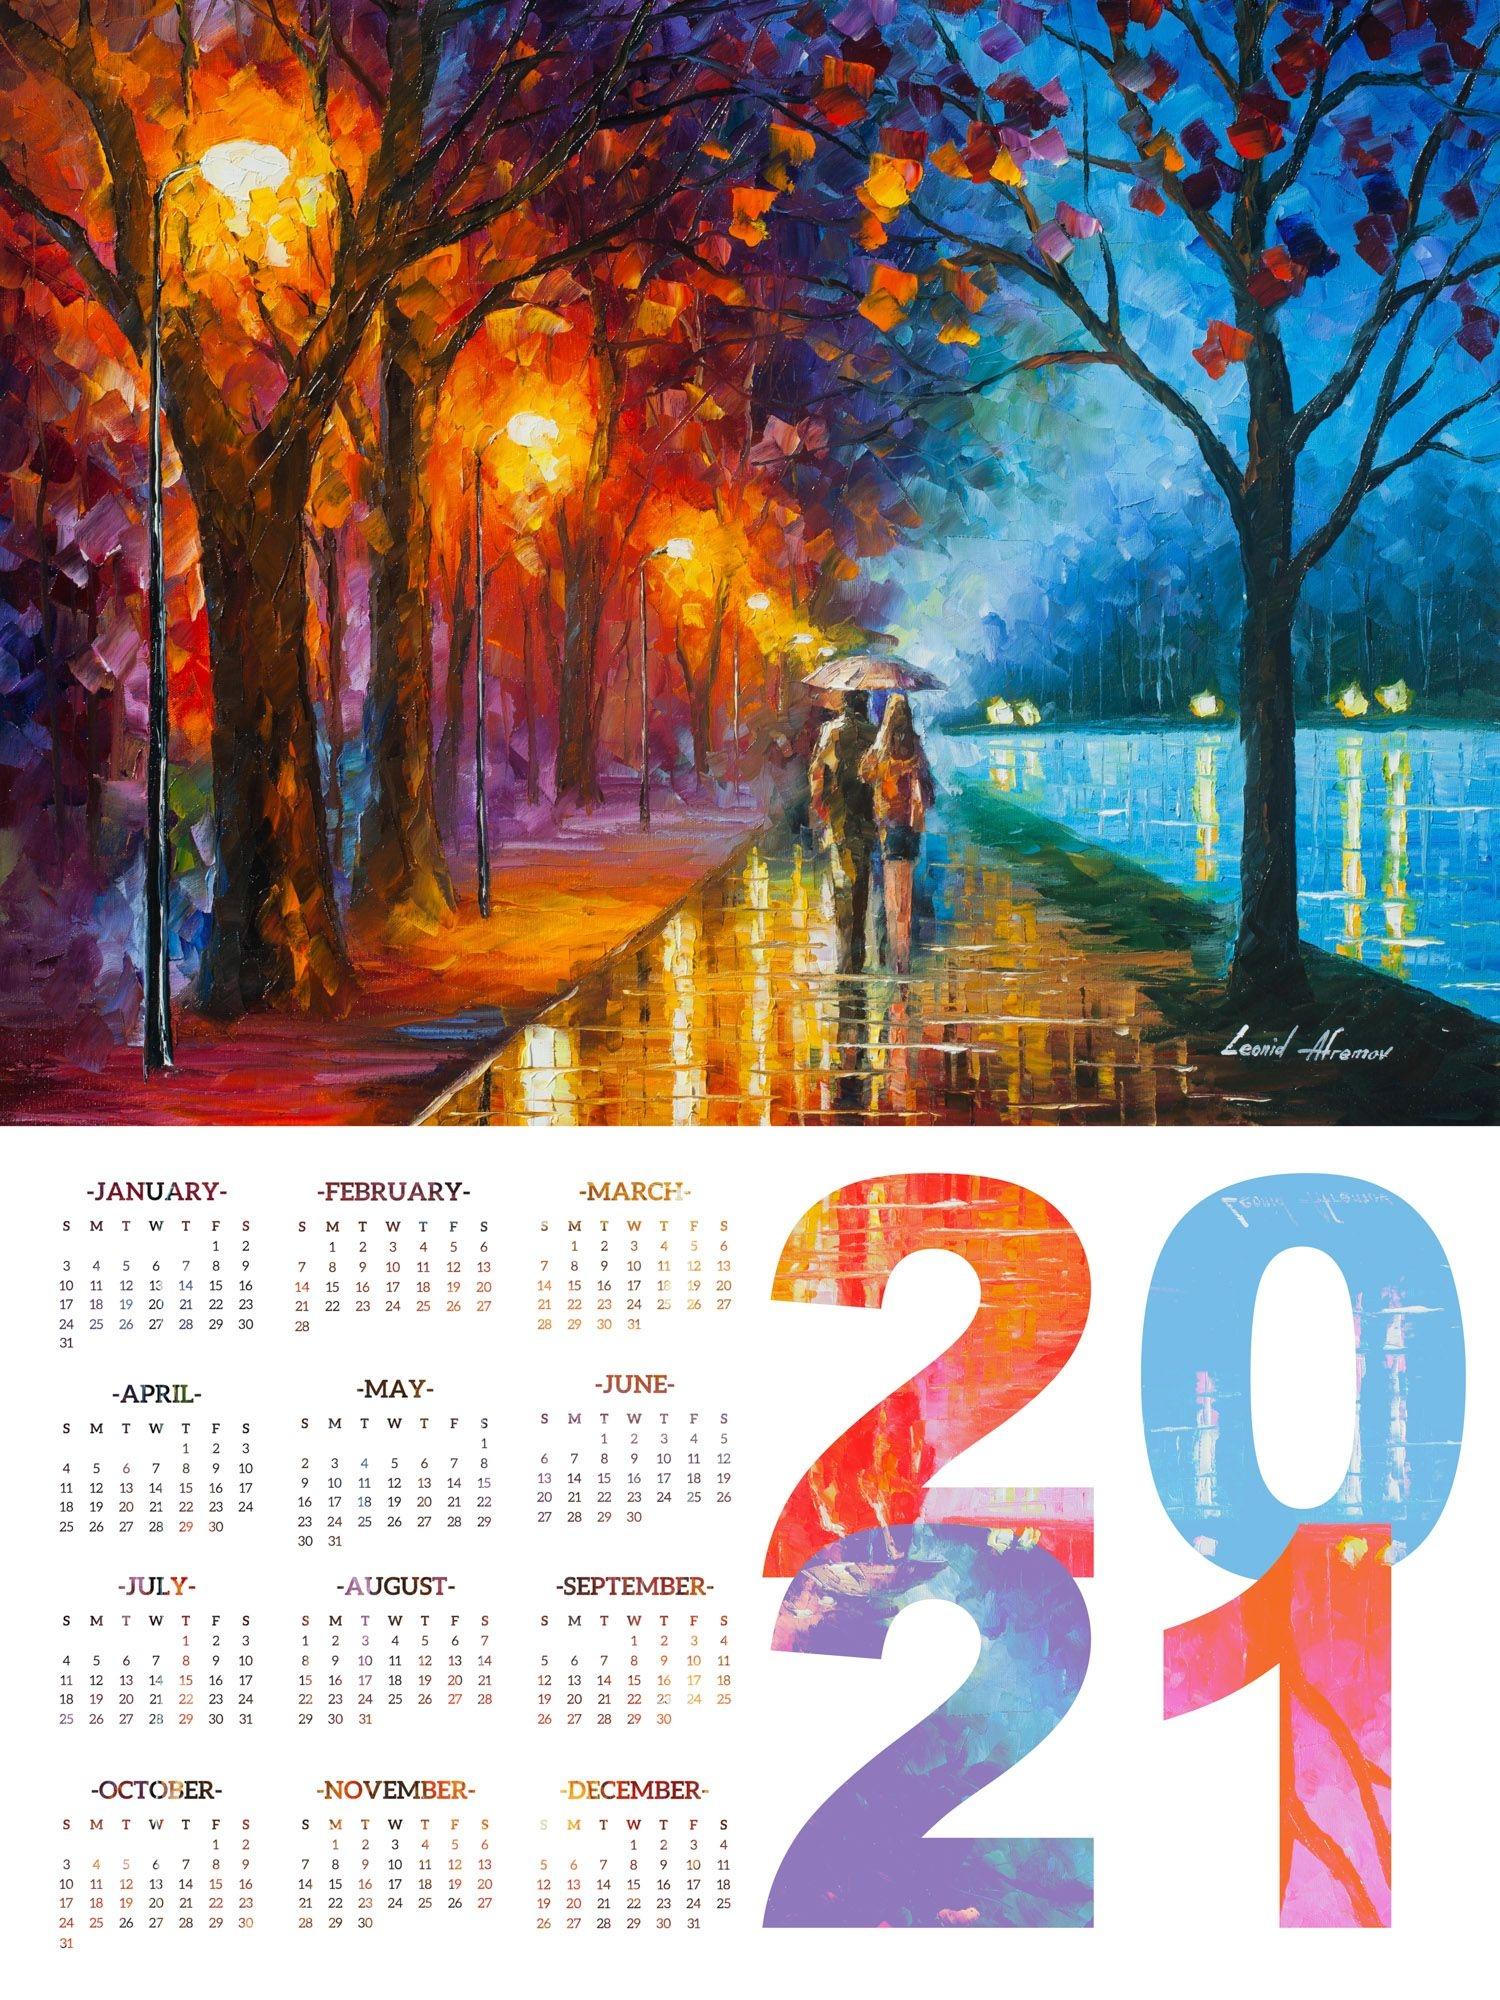 Calendar 2021 - Print On High Quality Artistic Canvas